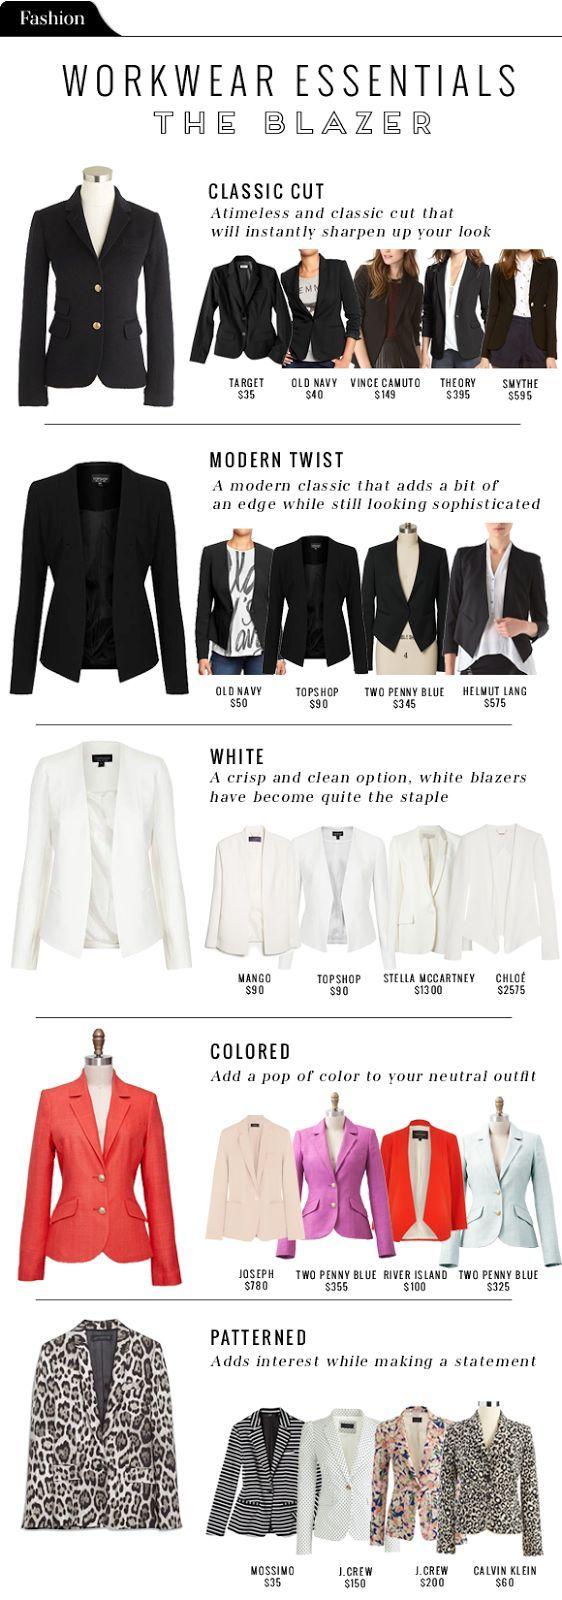 Fashion File: Workwear essentials - The Blazer